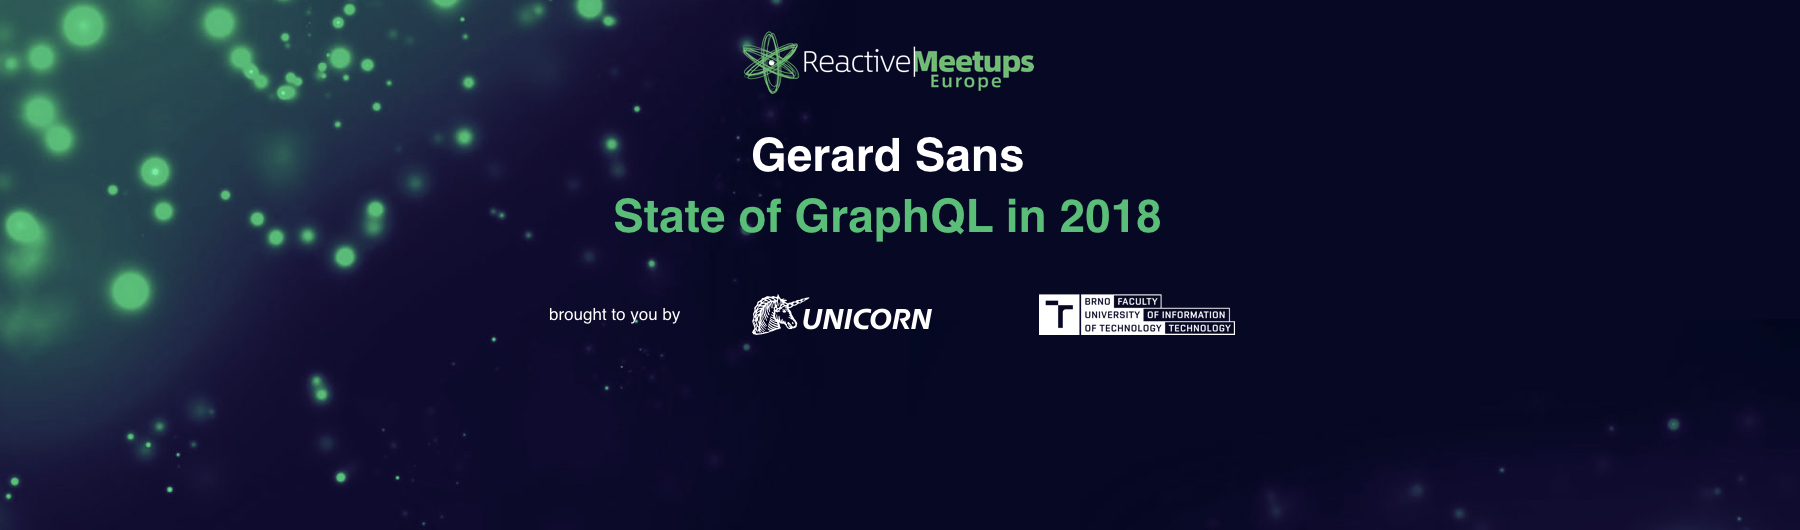 ReactiveMeetups Brno | Gerard Sans